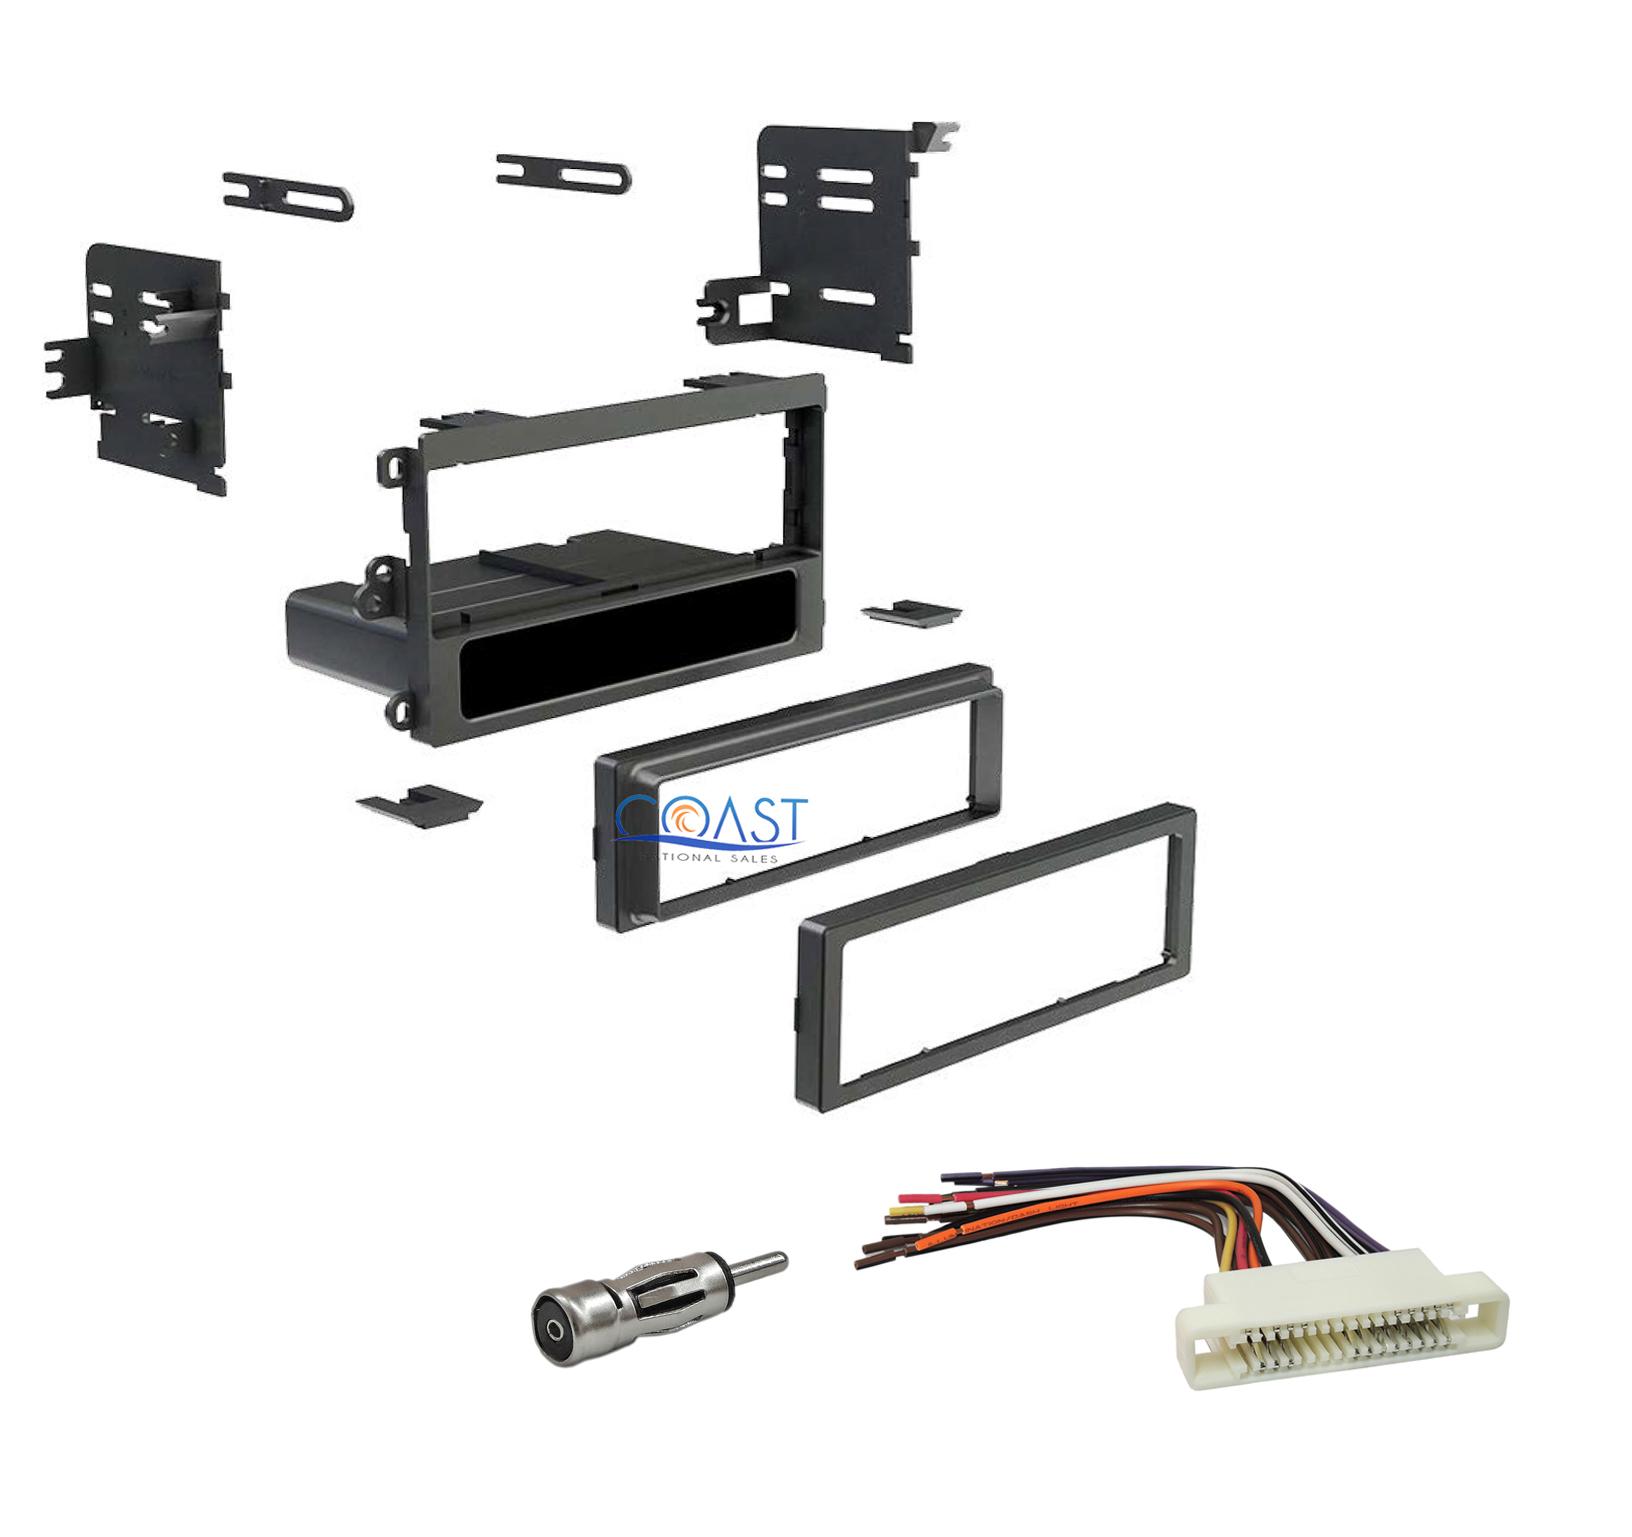 single din stereo install dash kit harness antenna for. Black Bedroom Furniture Sets. Home Design Ideas